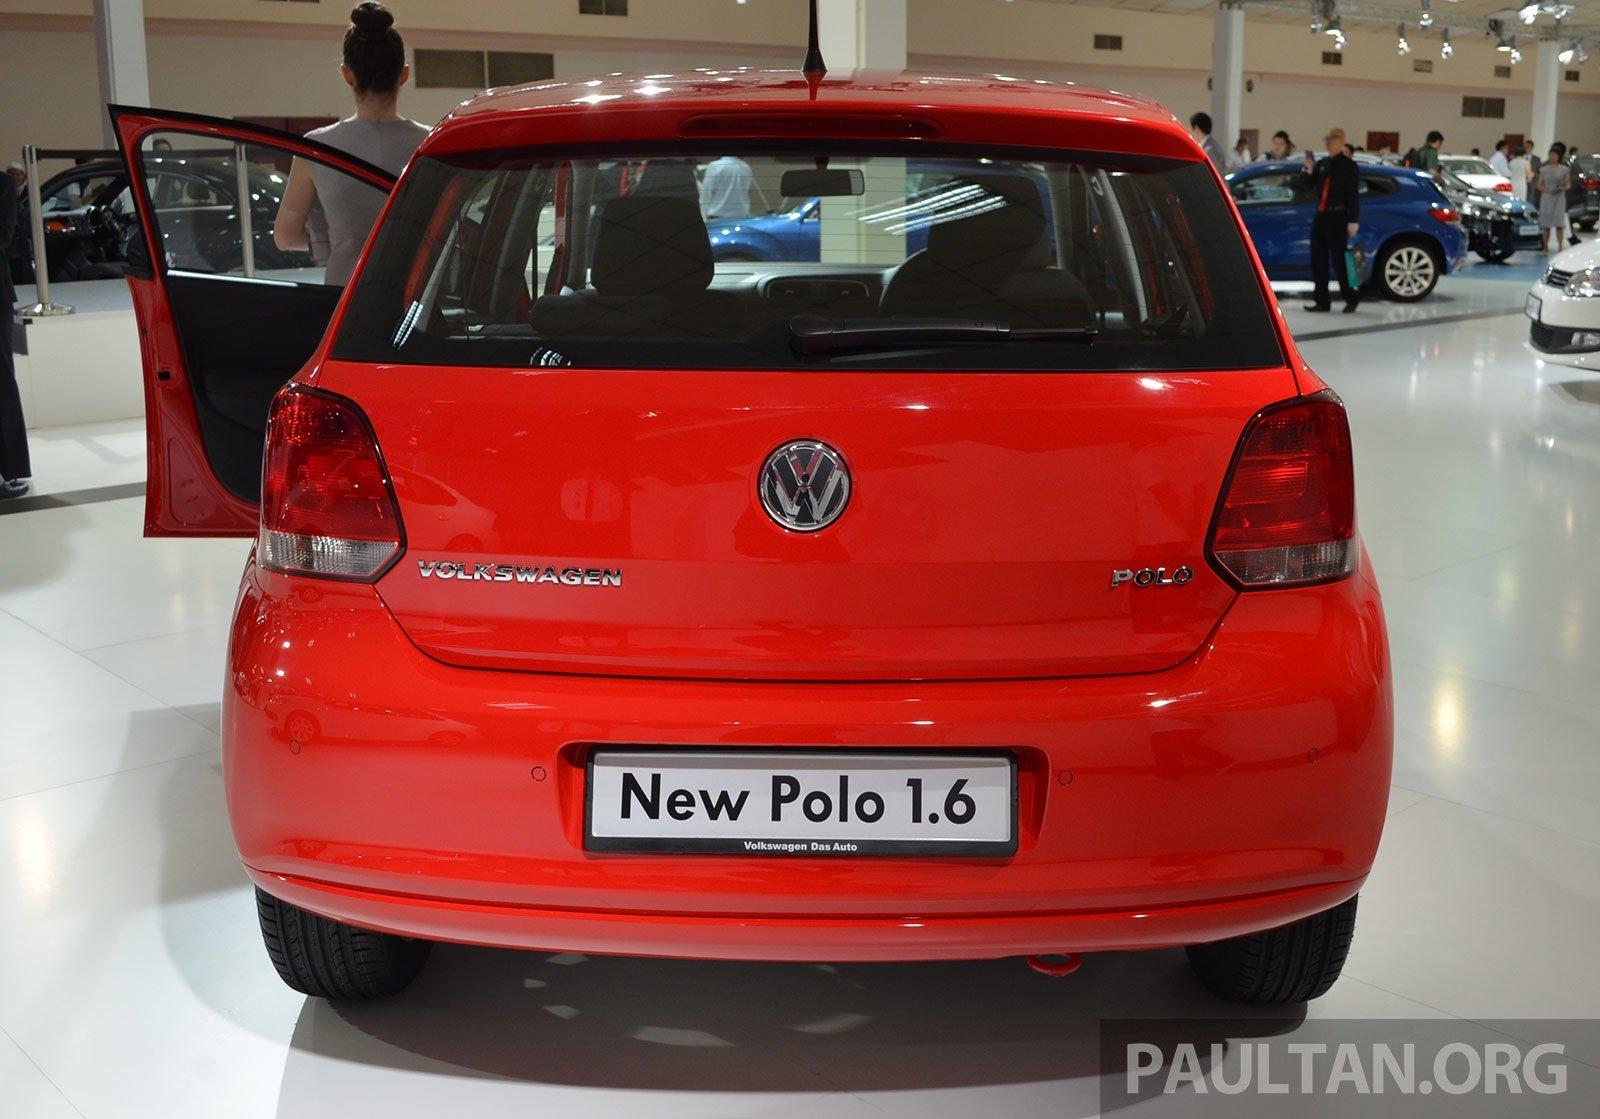 2014 volkswagen polo hatchback previewed at klims13 ckd 1 6 mpi 6sp auto launch in 2014. Black Bedroom Furniture Sets. Home Design Ideas